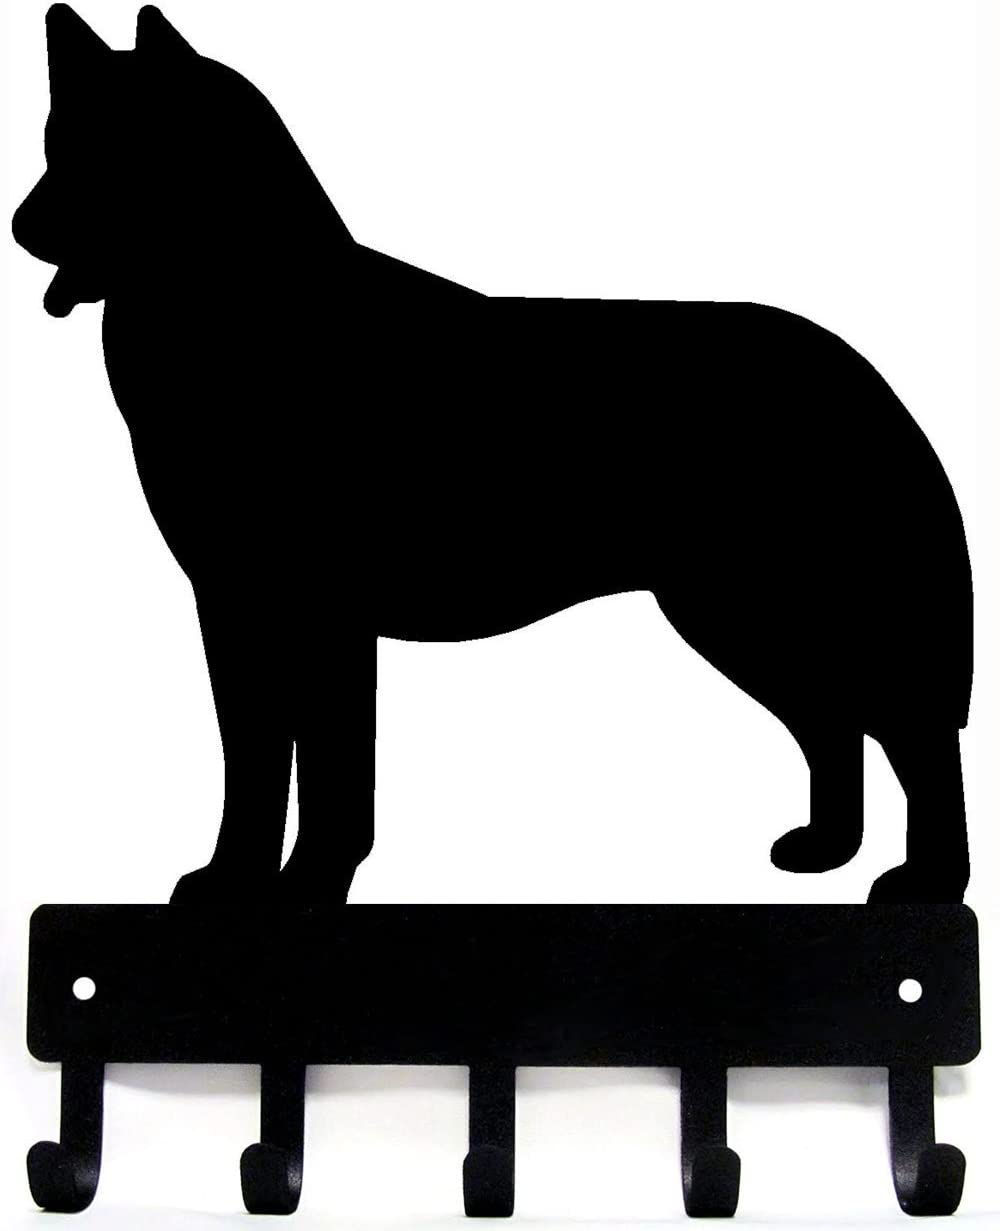 The Metal Peddler Husky Dog - Key Hooks & Holder - Small 6 inch Wide - Made in USA